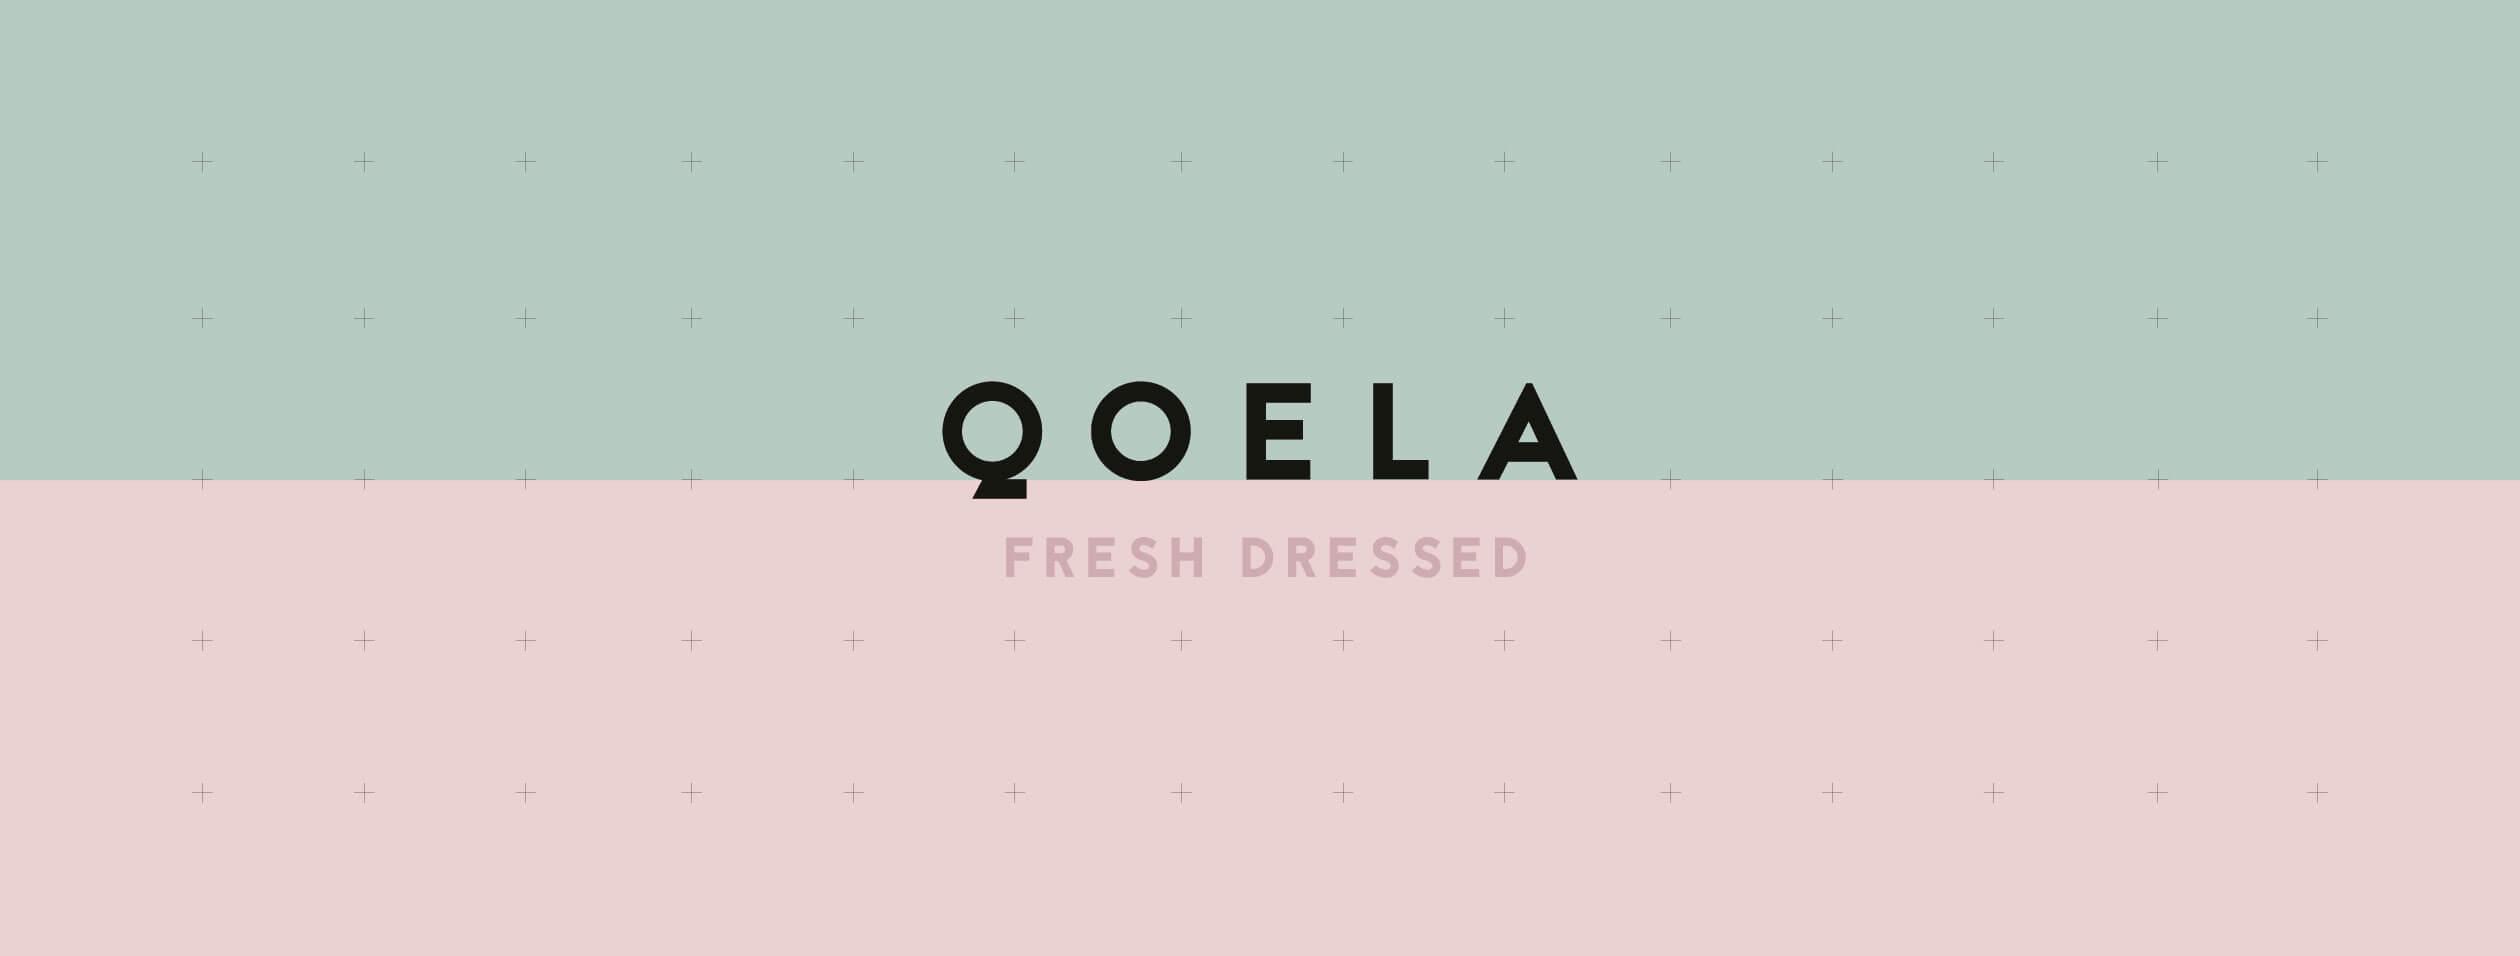 QOELA-03